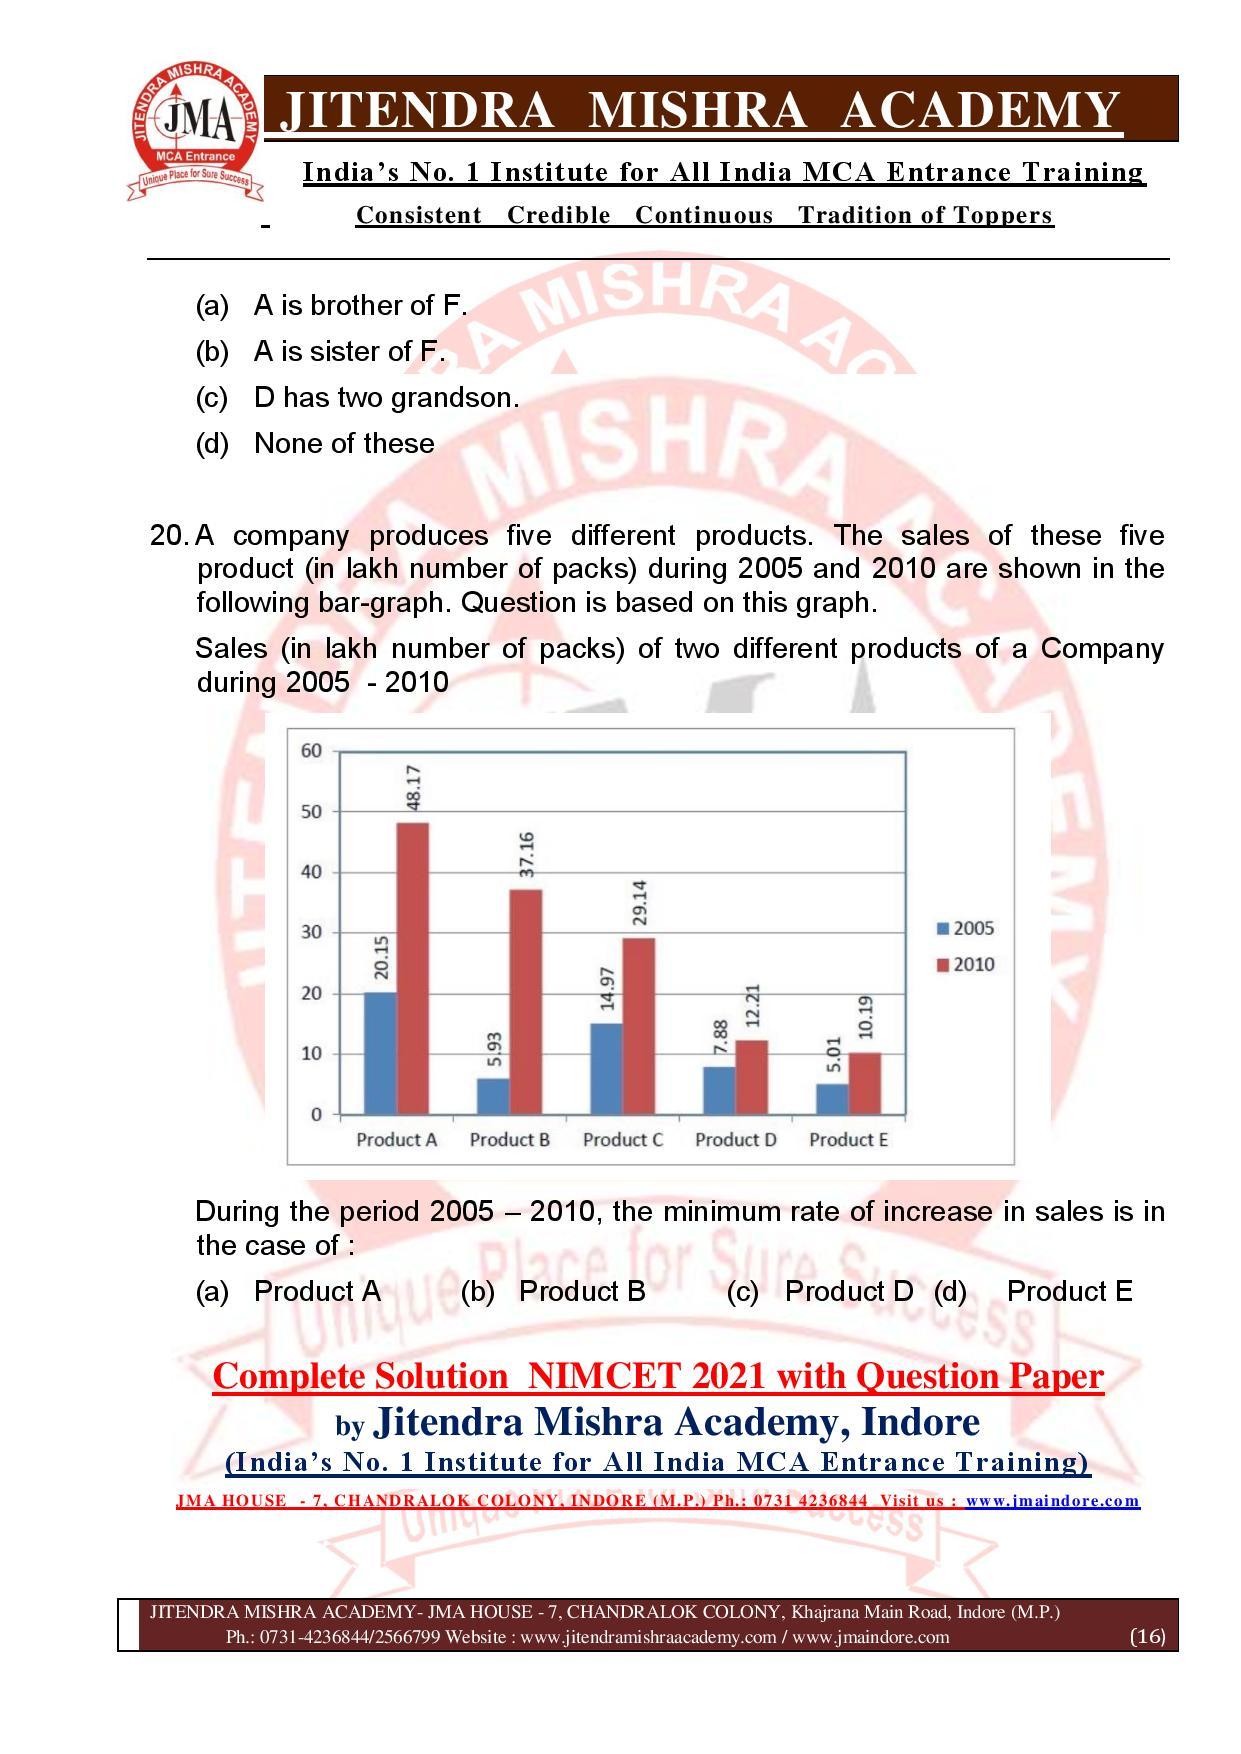 NIMCET 2021 QUESTION PAPER (F)-page-016